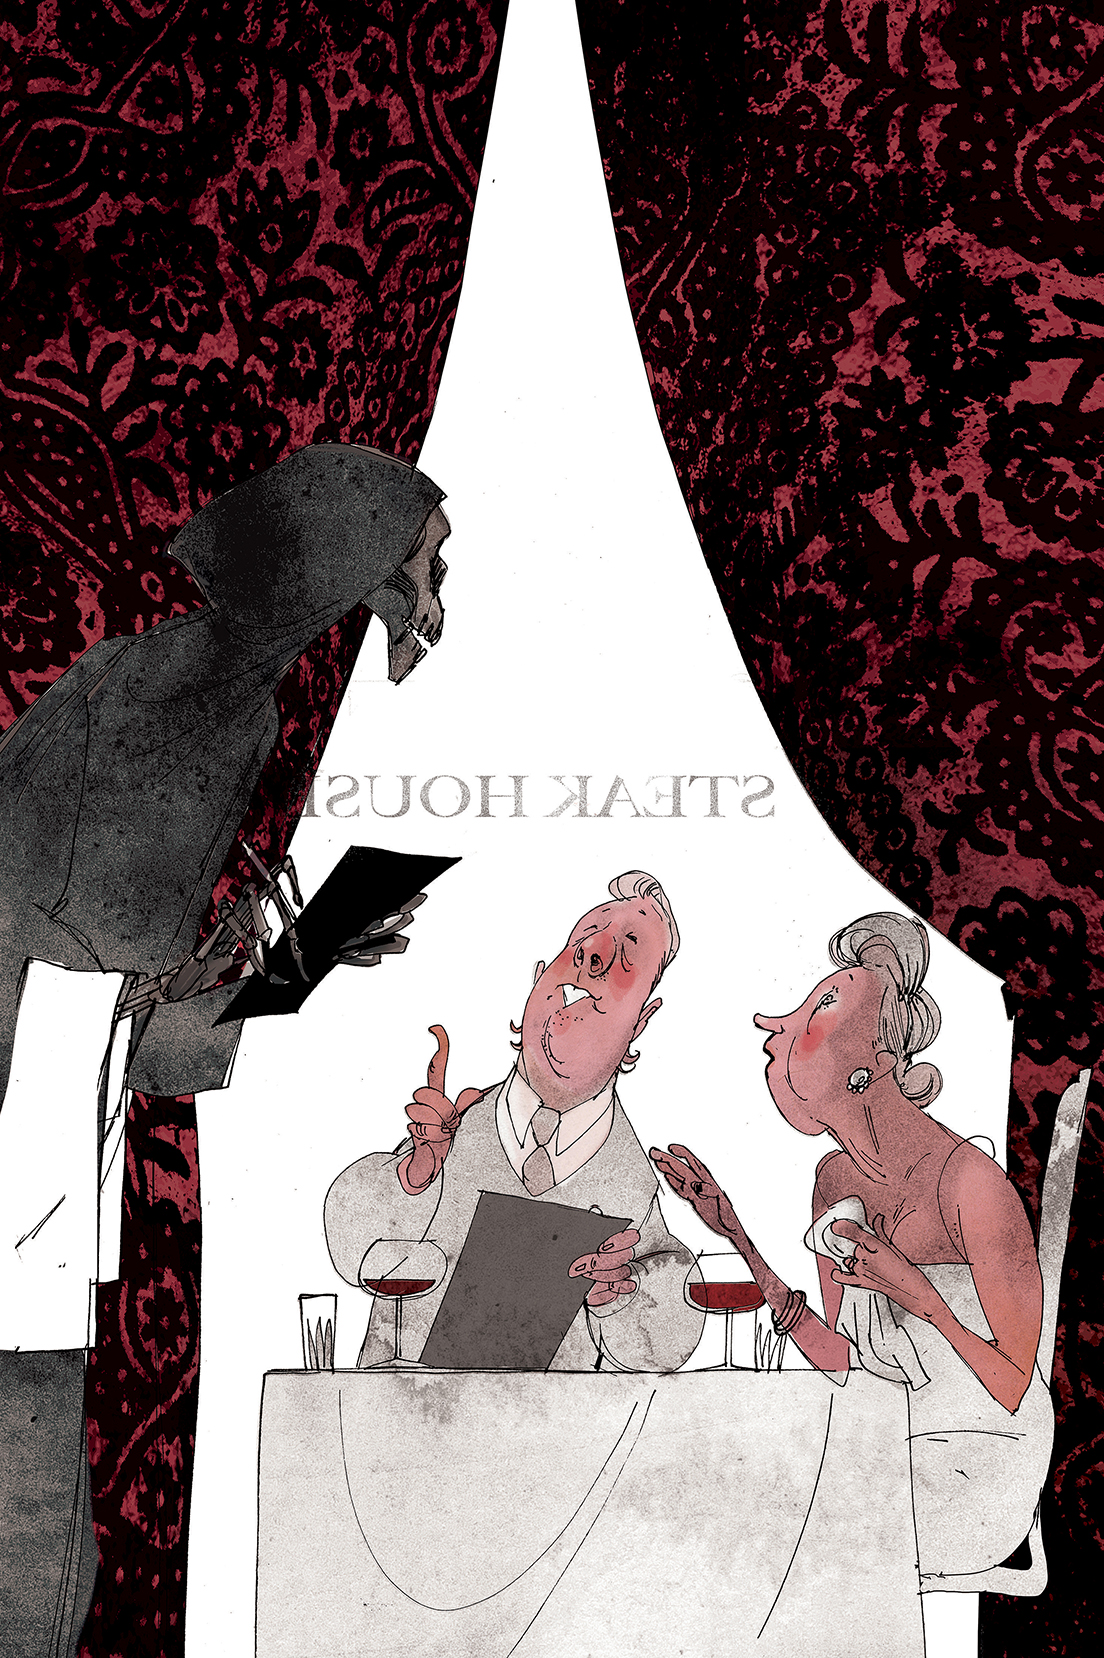 Meat lovers, 2015